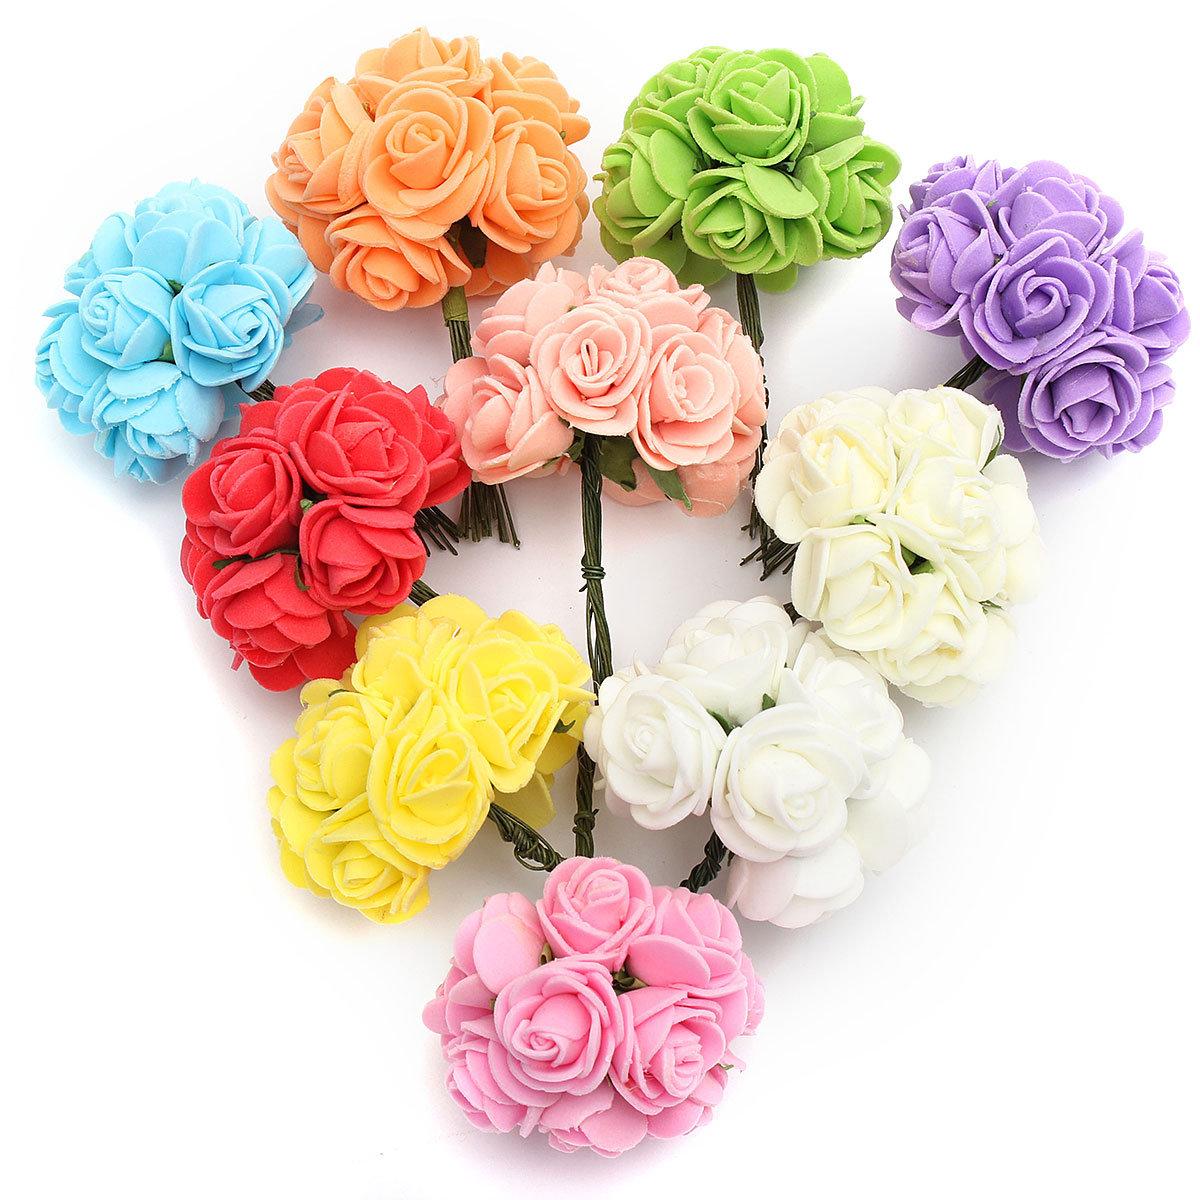 12PCS Bride Bouquet Paper Rose Flowers With Wire Stems Wedding Home Party Decoration